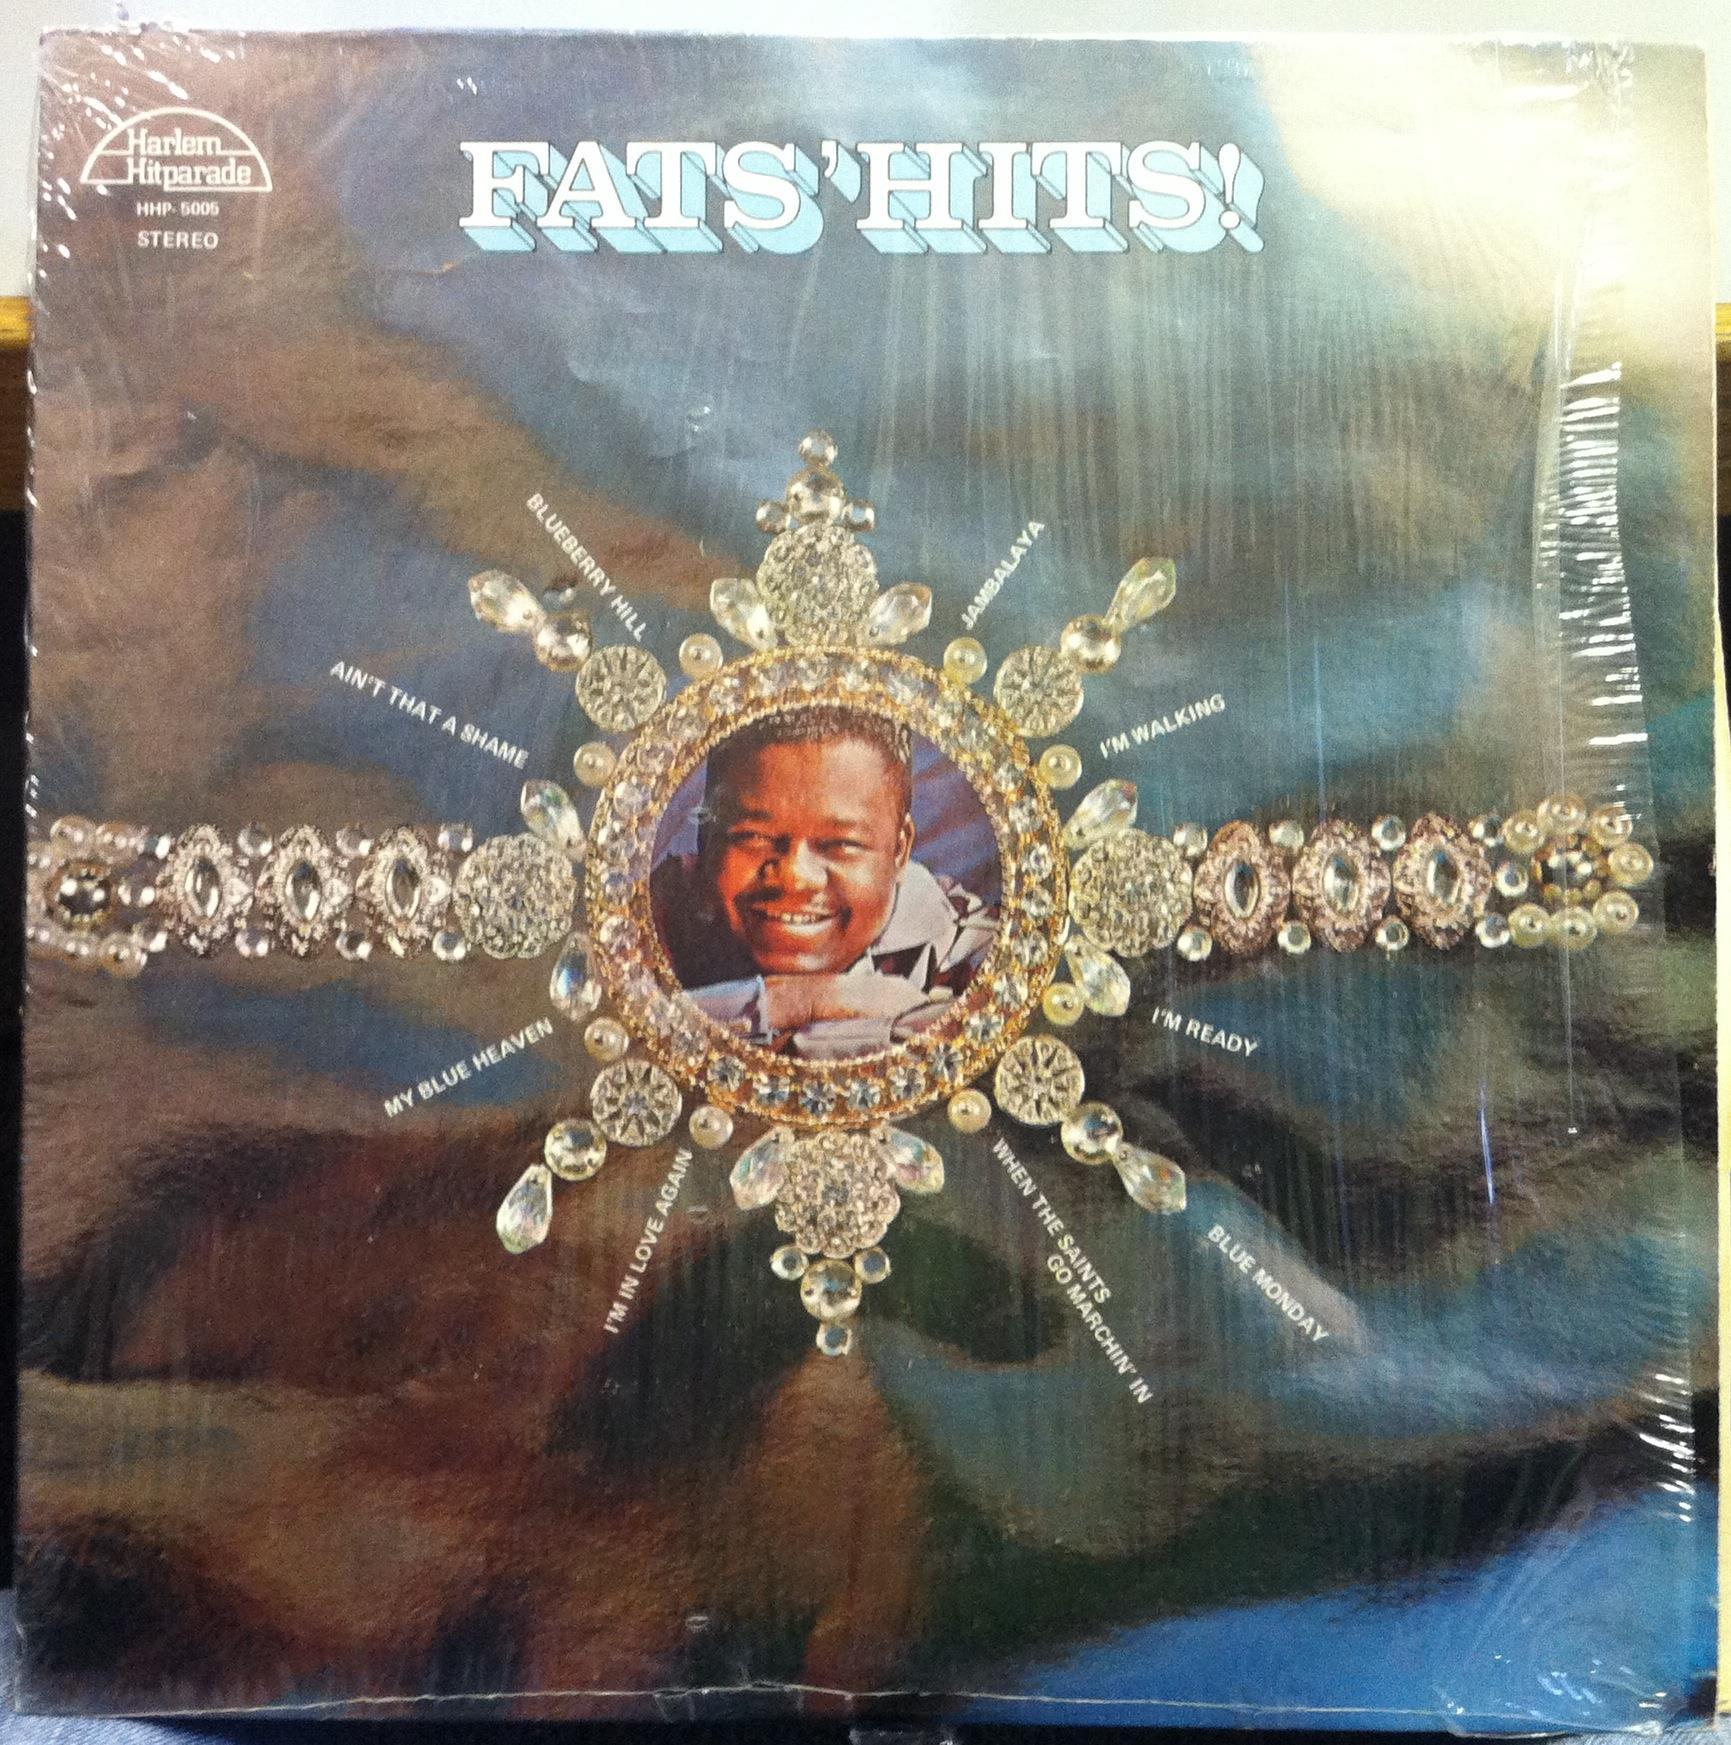 FATS DOMINO - Fats Domino Fats Hits Lp Vg+ Hhp-5005 Vinyl Stereo Harlem Record (fats Hits)